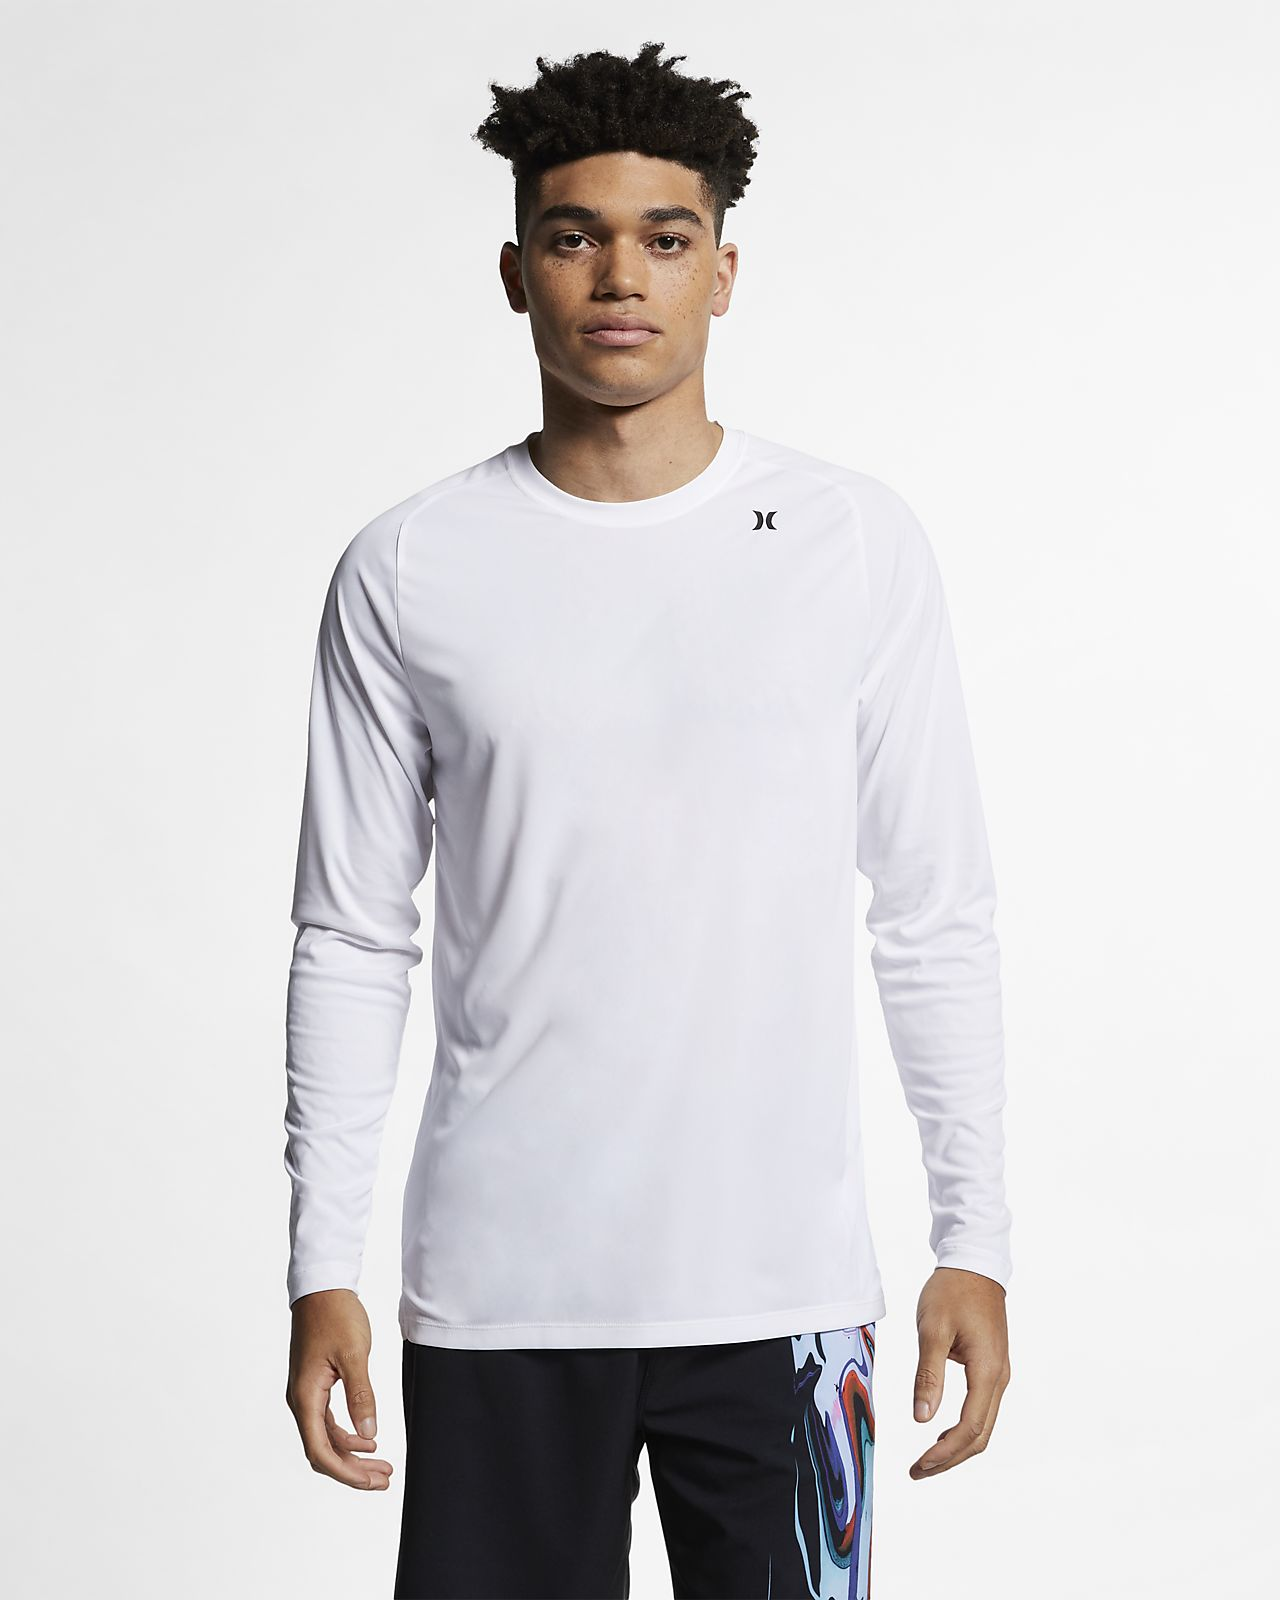 167d5806e775 Pánské tričko s dlouhým rukávem Hurley Quick Dry. Nike.com CZ